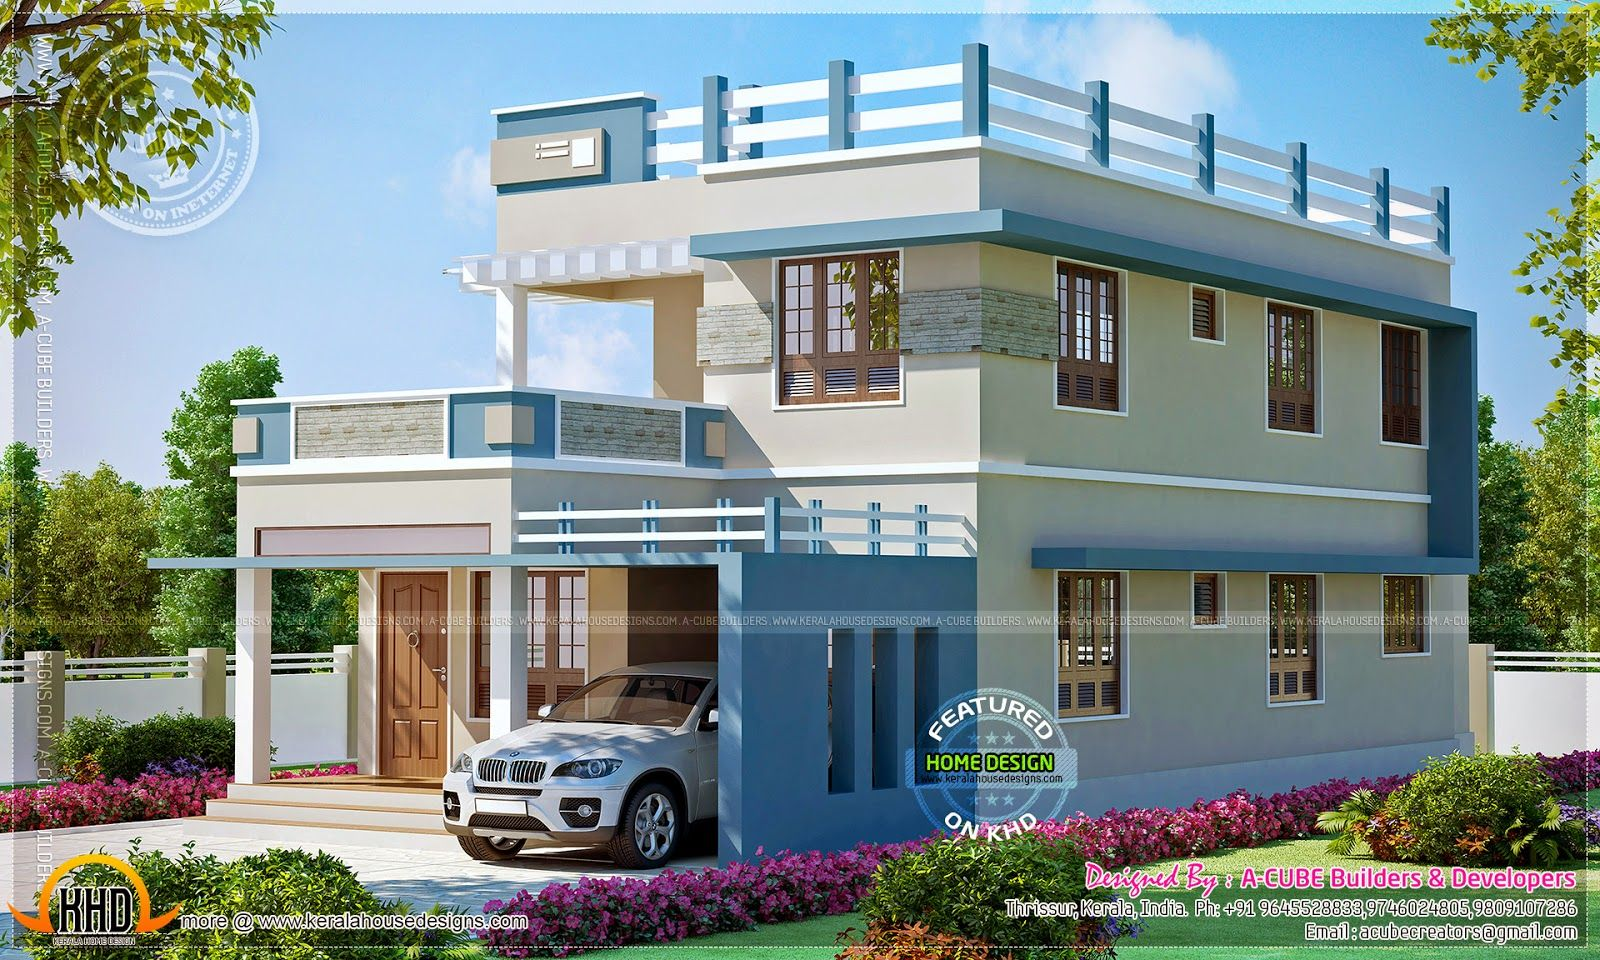 28 New Home Design Home Design New Home Design Kerala House Design Cool House Designs House Design